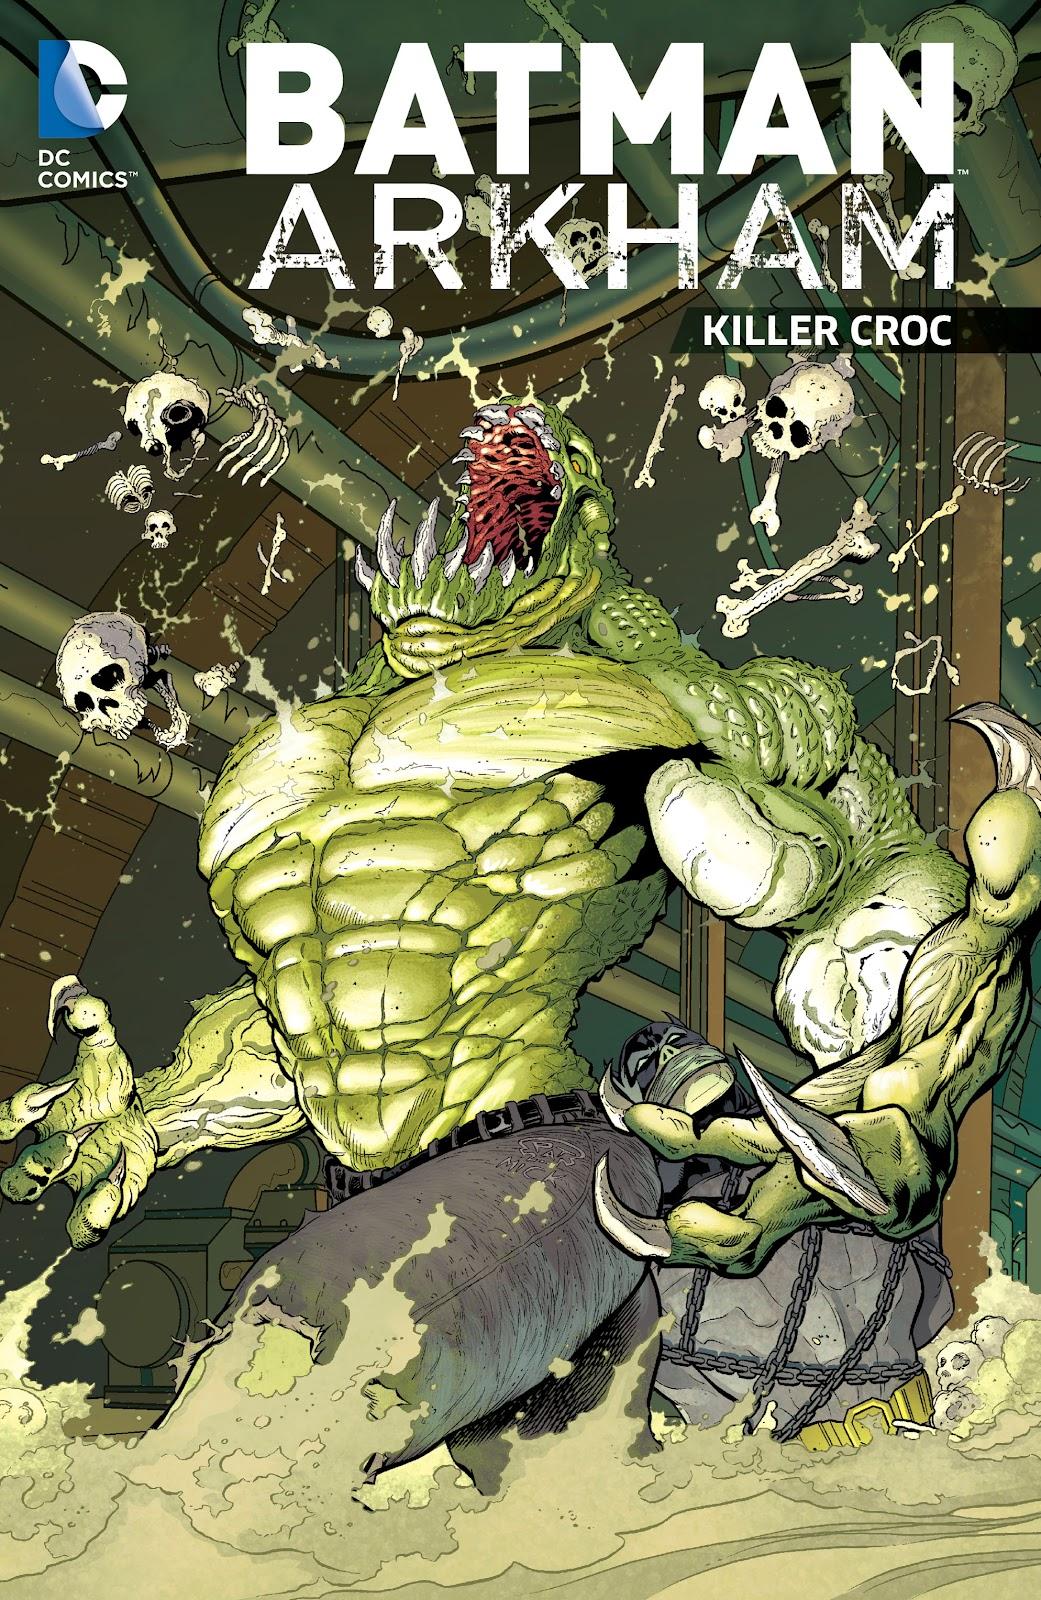 Batman: Arkham: Killer Croc Full Page 1